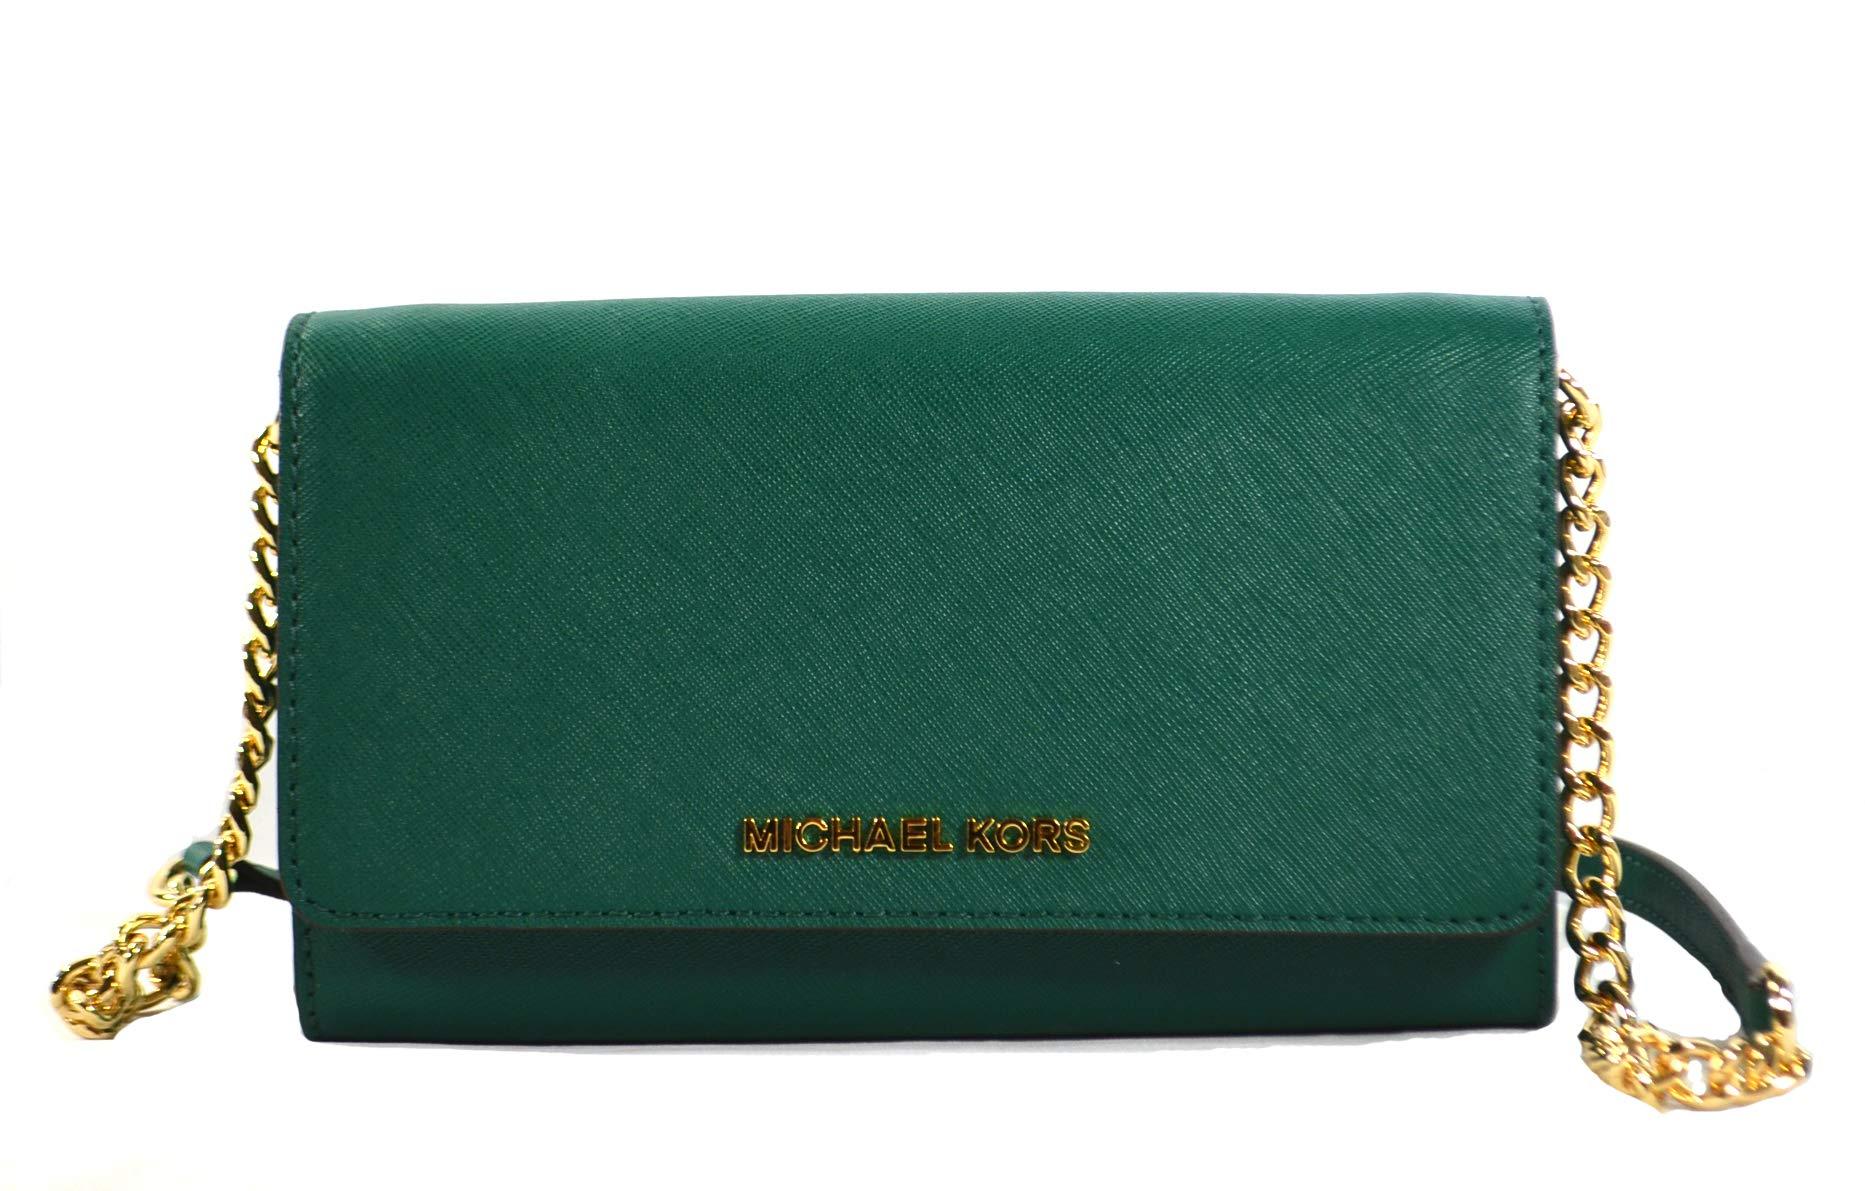 Michael Kors Jet Set Travel Saffiano Leather Small Crossbody Bag Purse Handbag Iphone Smart Phone Holder Case, Damson (Emerald)